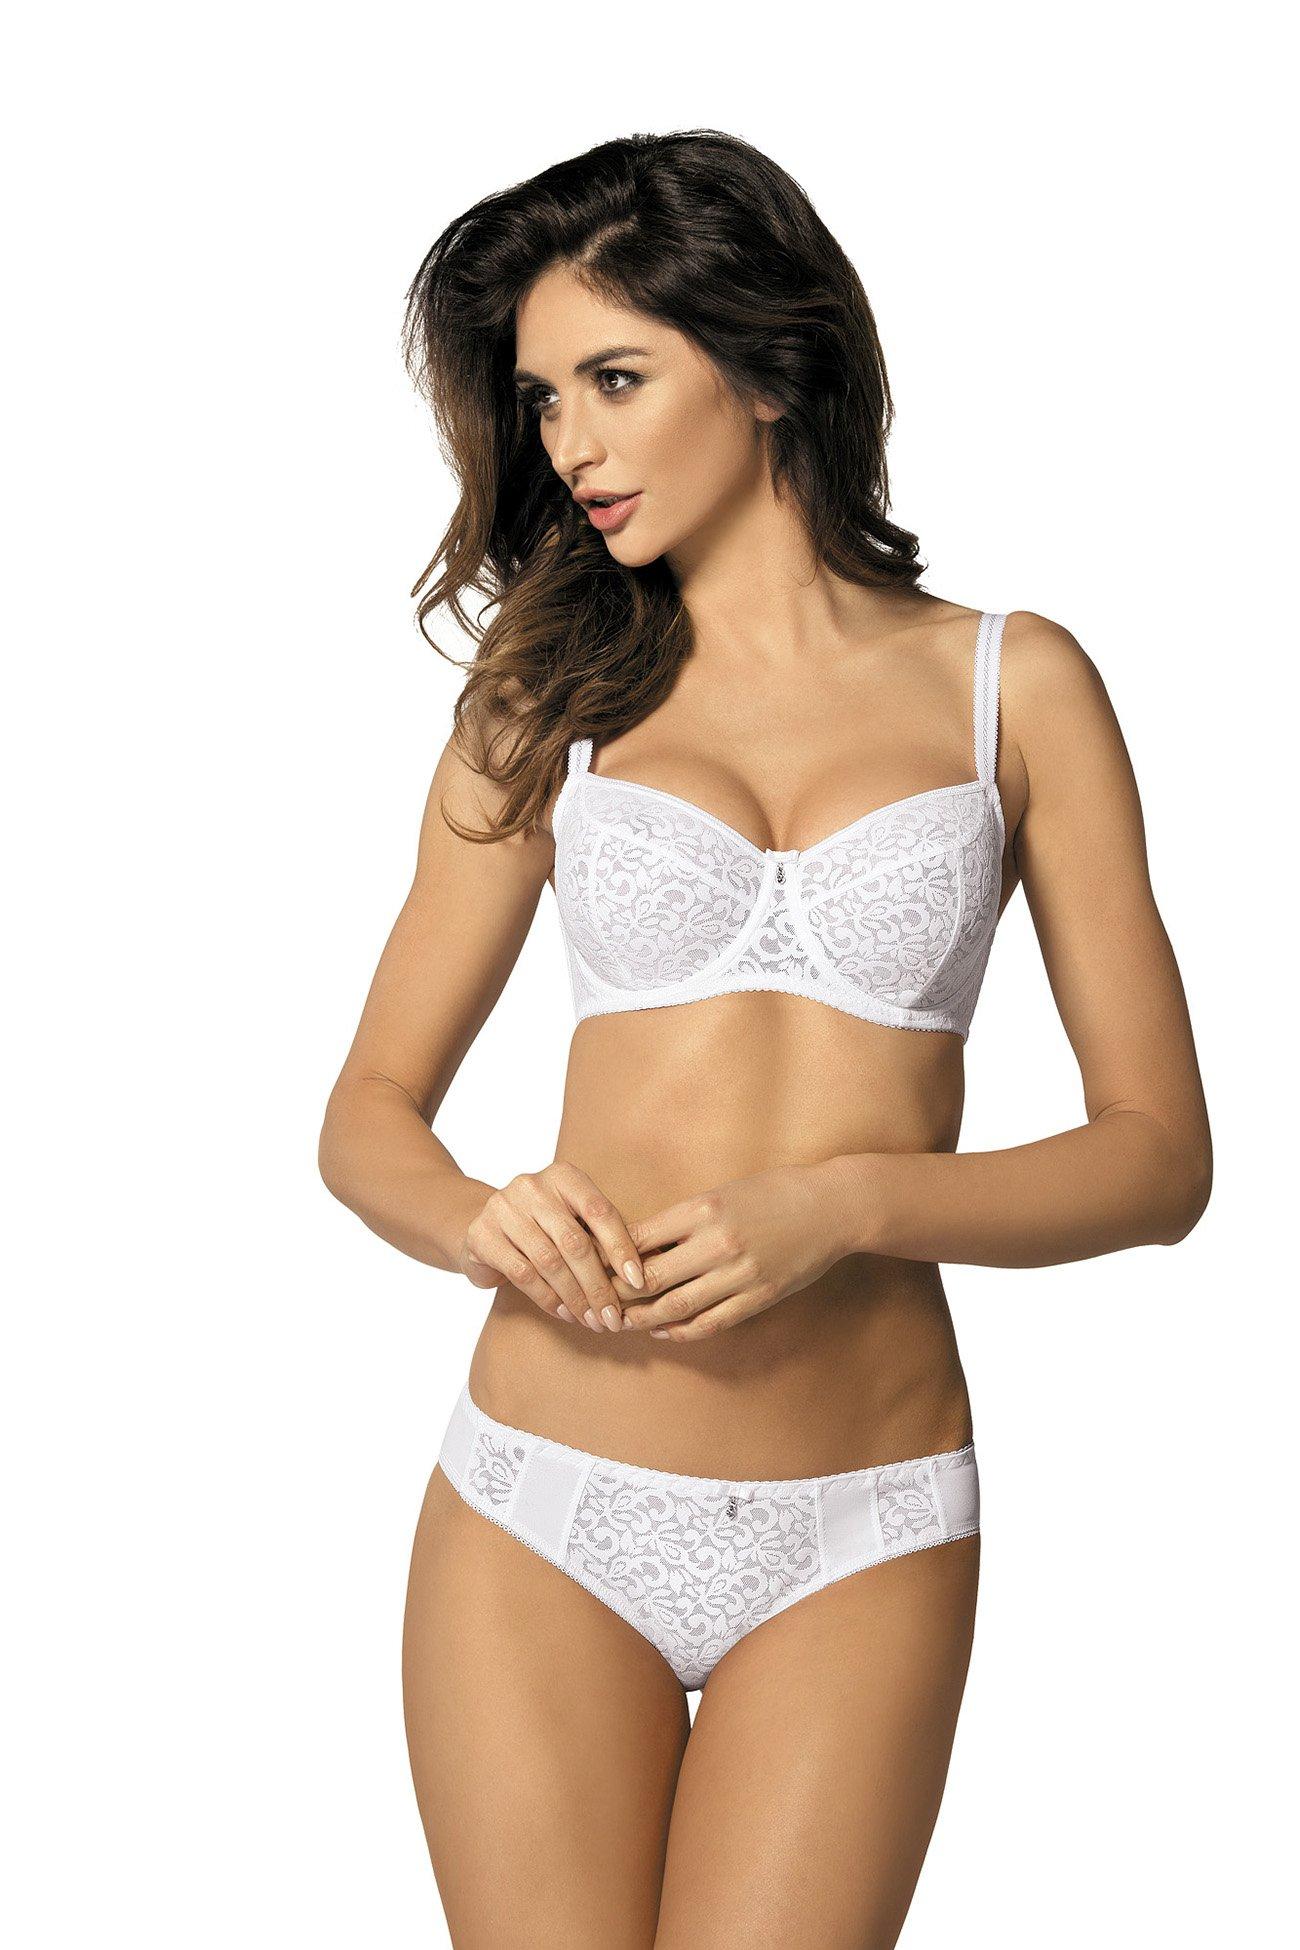 f51235ce501829 Gorteks Marilyn/B2 soft bra white Classic collection